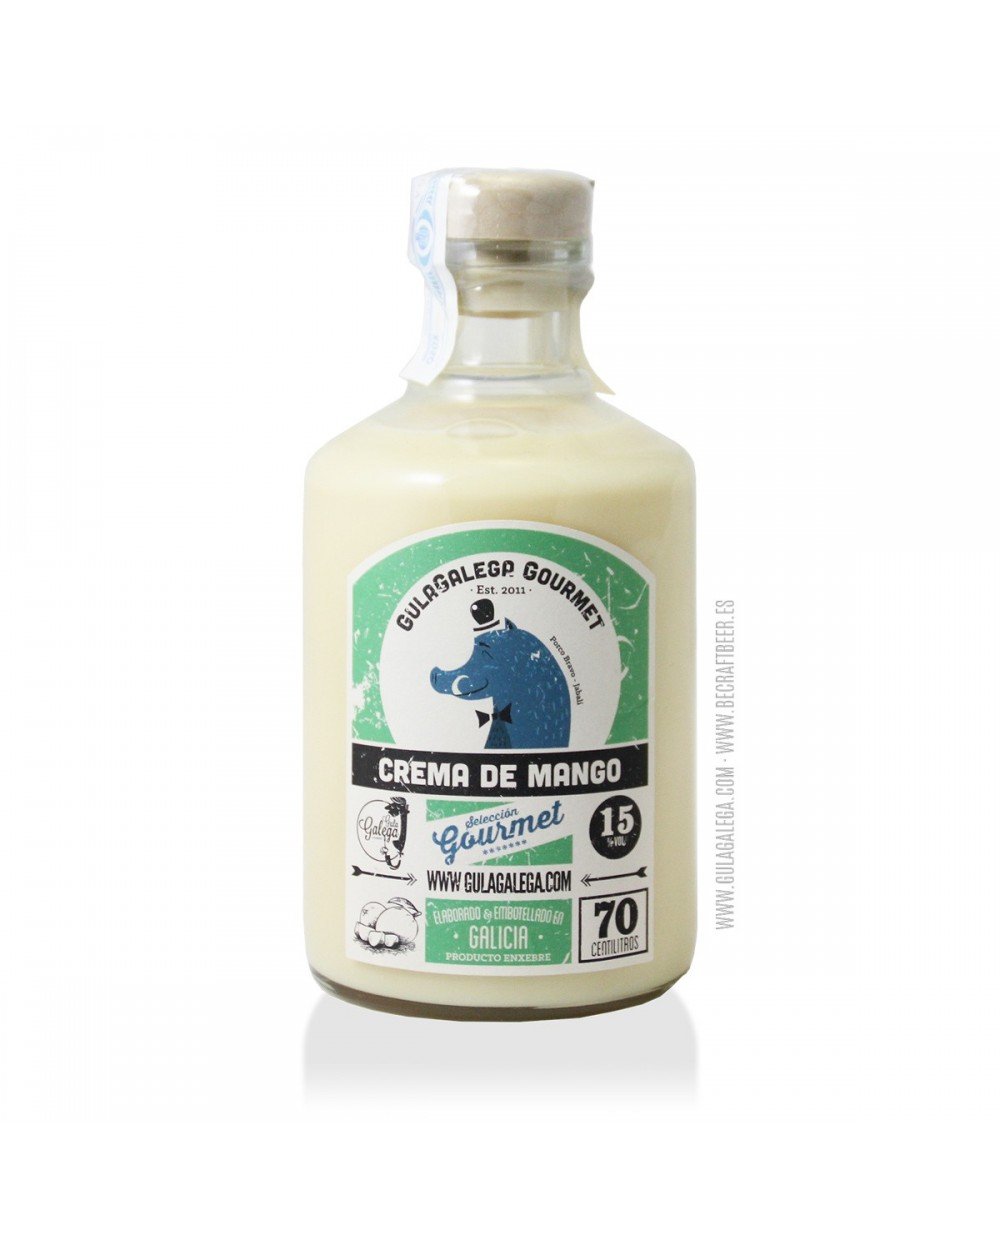 Crema de Mango GulaGalega Gourmet 70 cl.